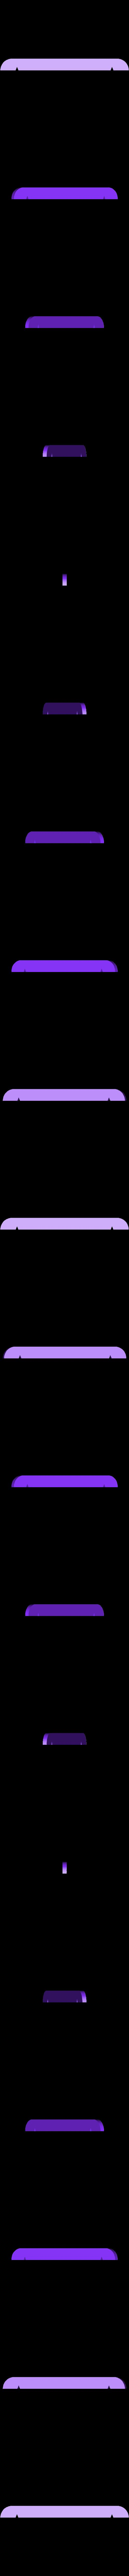 Color 3.1.stl Download free STL file Keychain Multicolor Hulk • 3D printer design, dukedoks